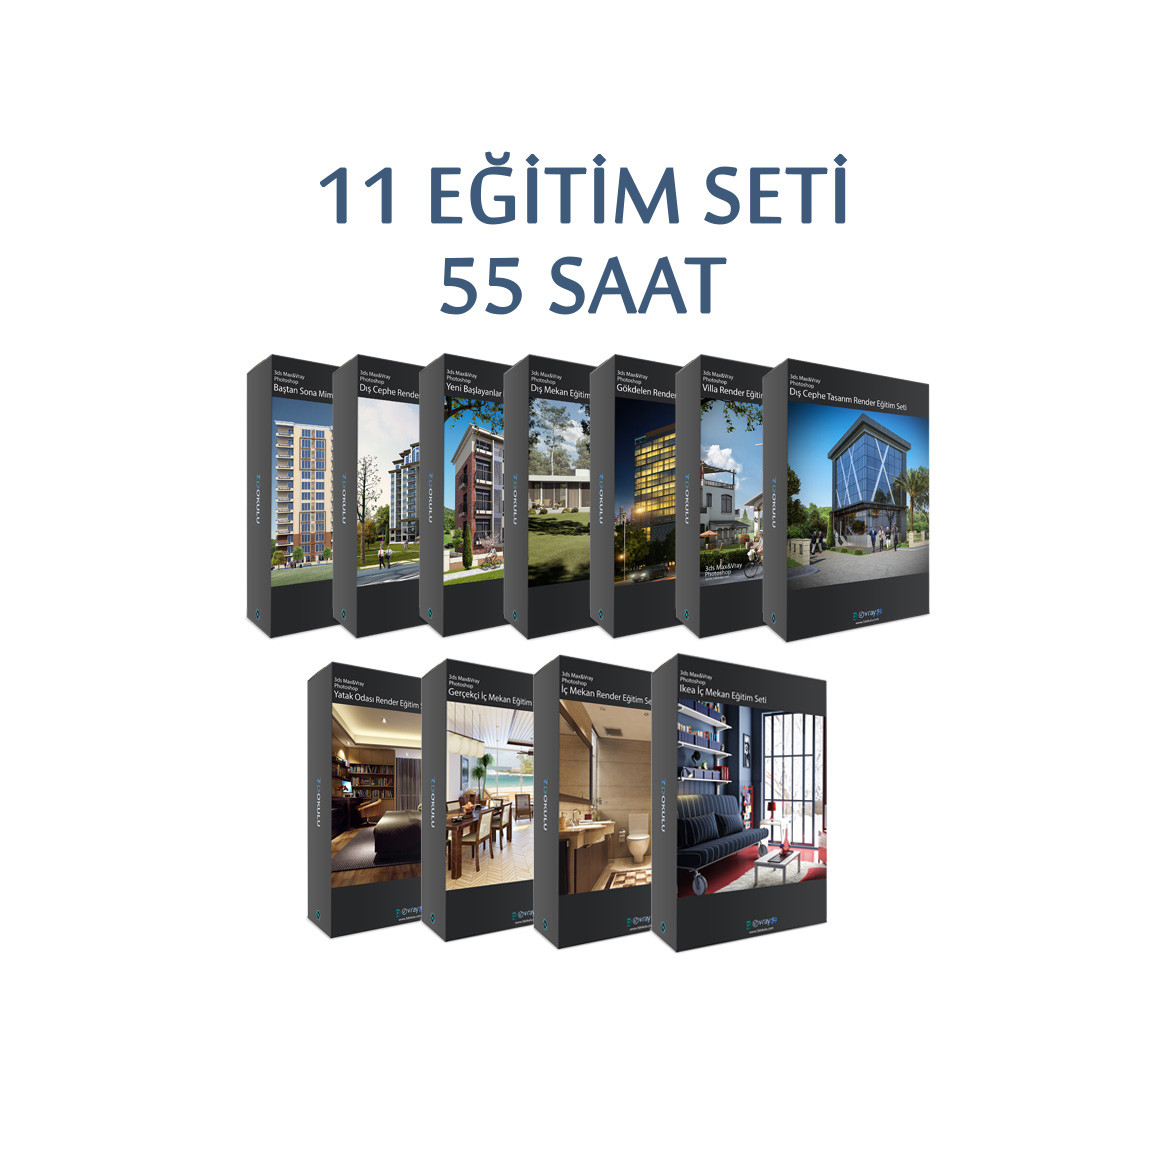 3ds Max ve VRay Render 11'li Eğitim Seti Paketi Taksitli Satışta